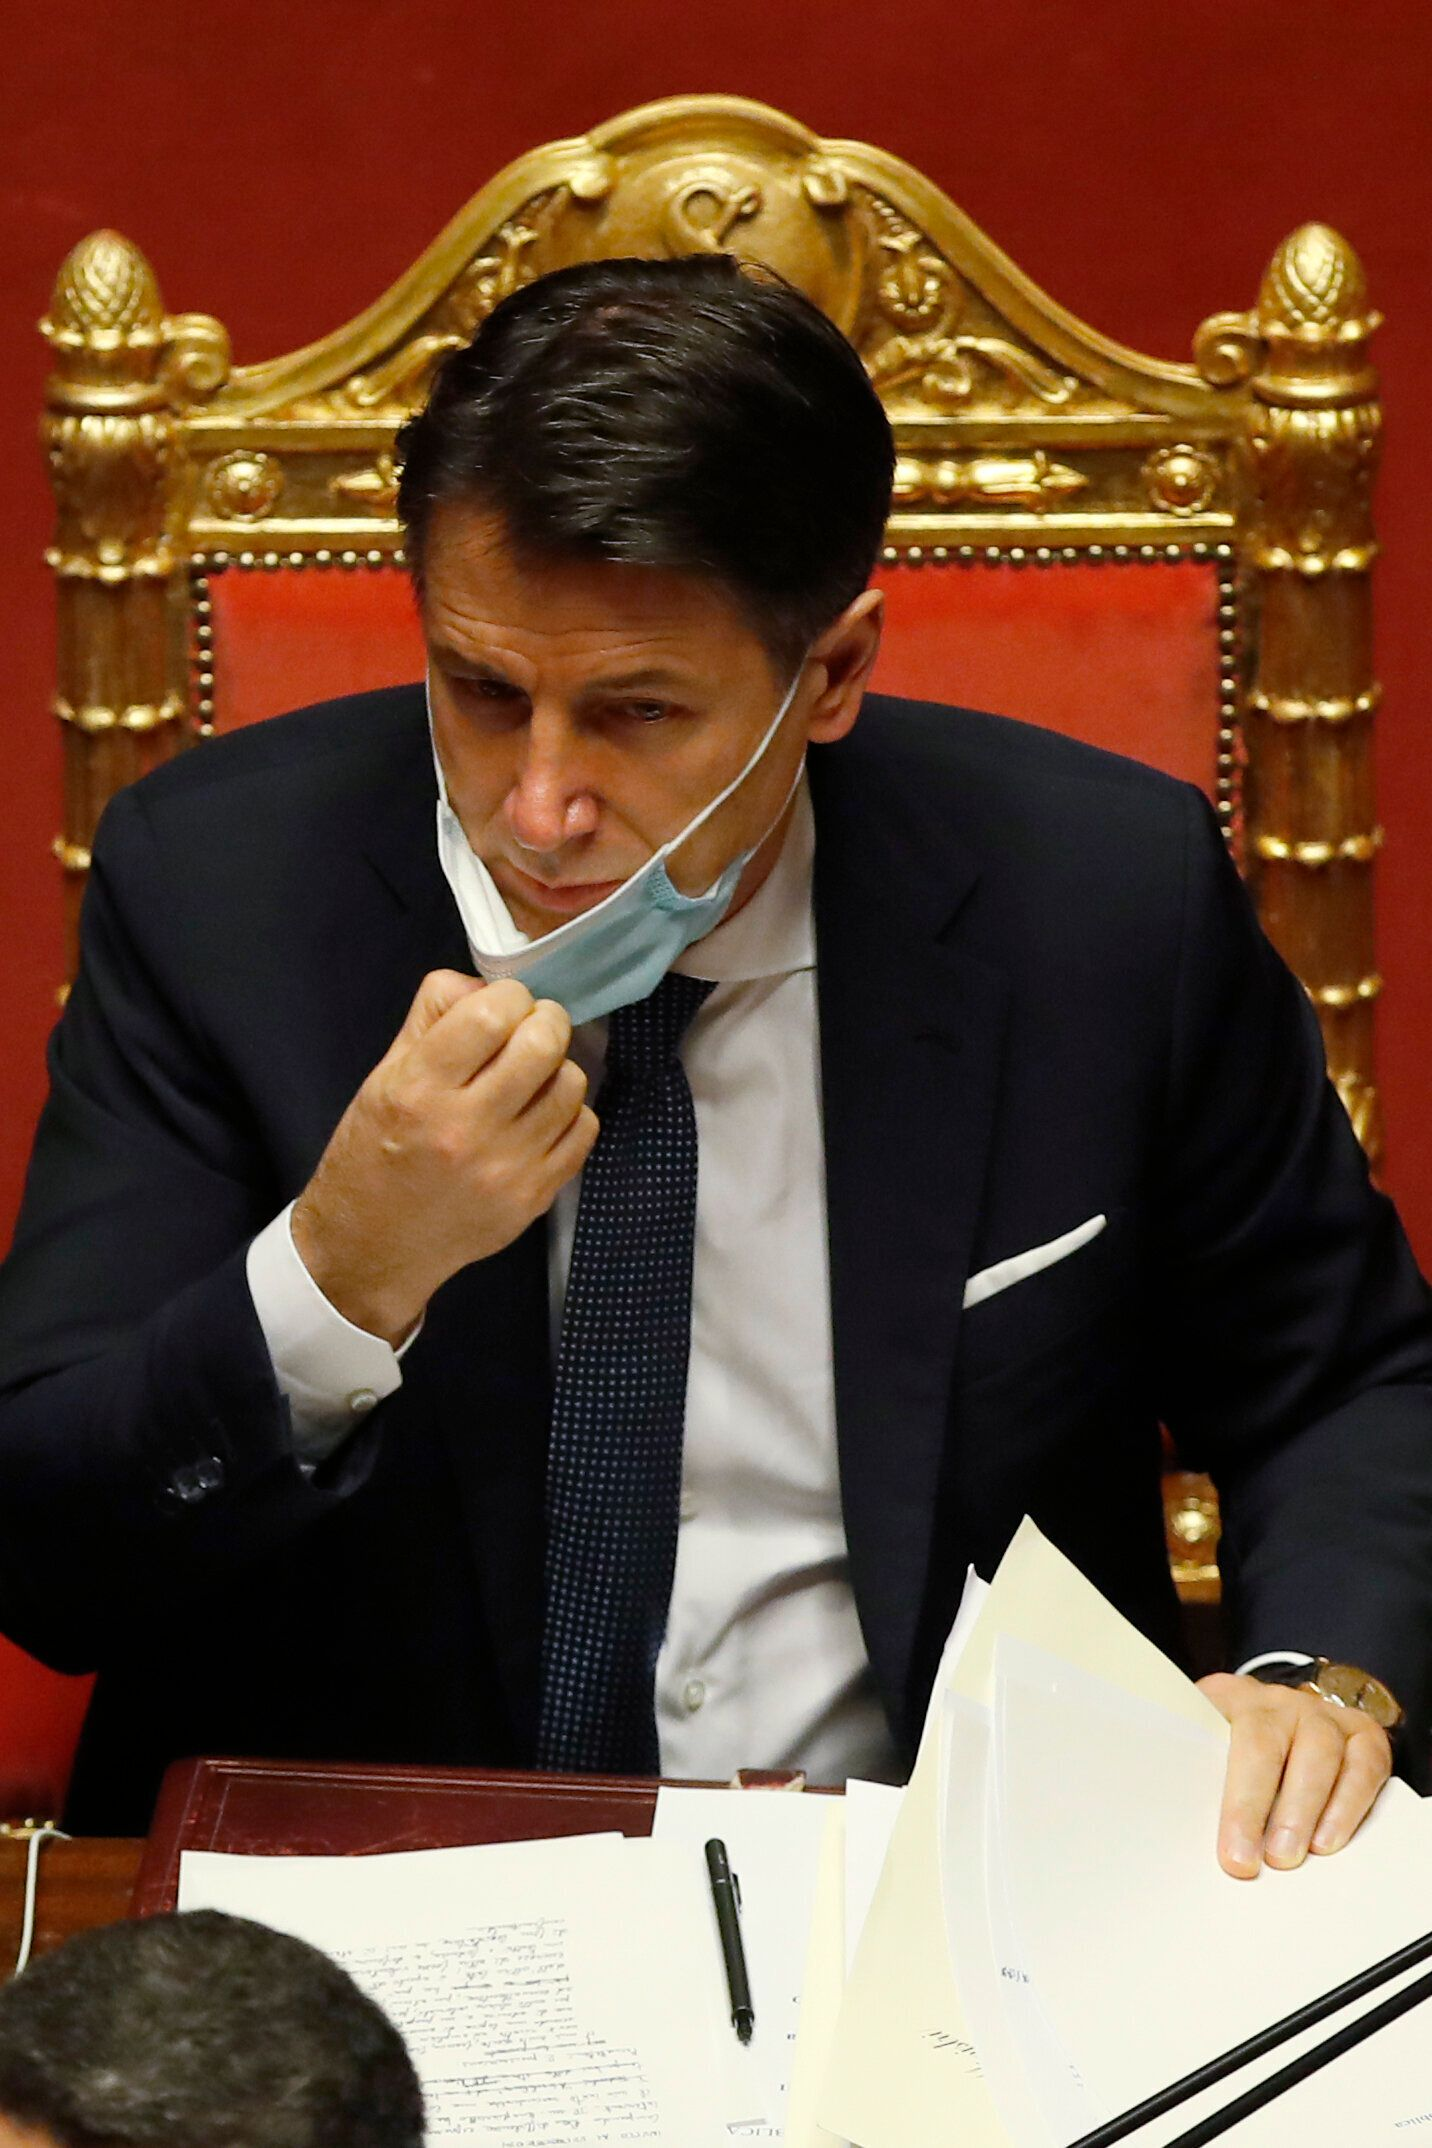 Italian Premier Giuseppe Conte To Offer Resignation As Government Wobbles